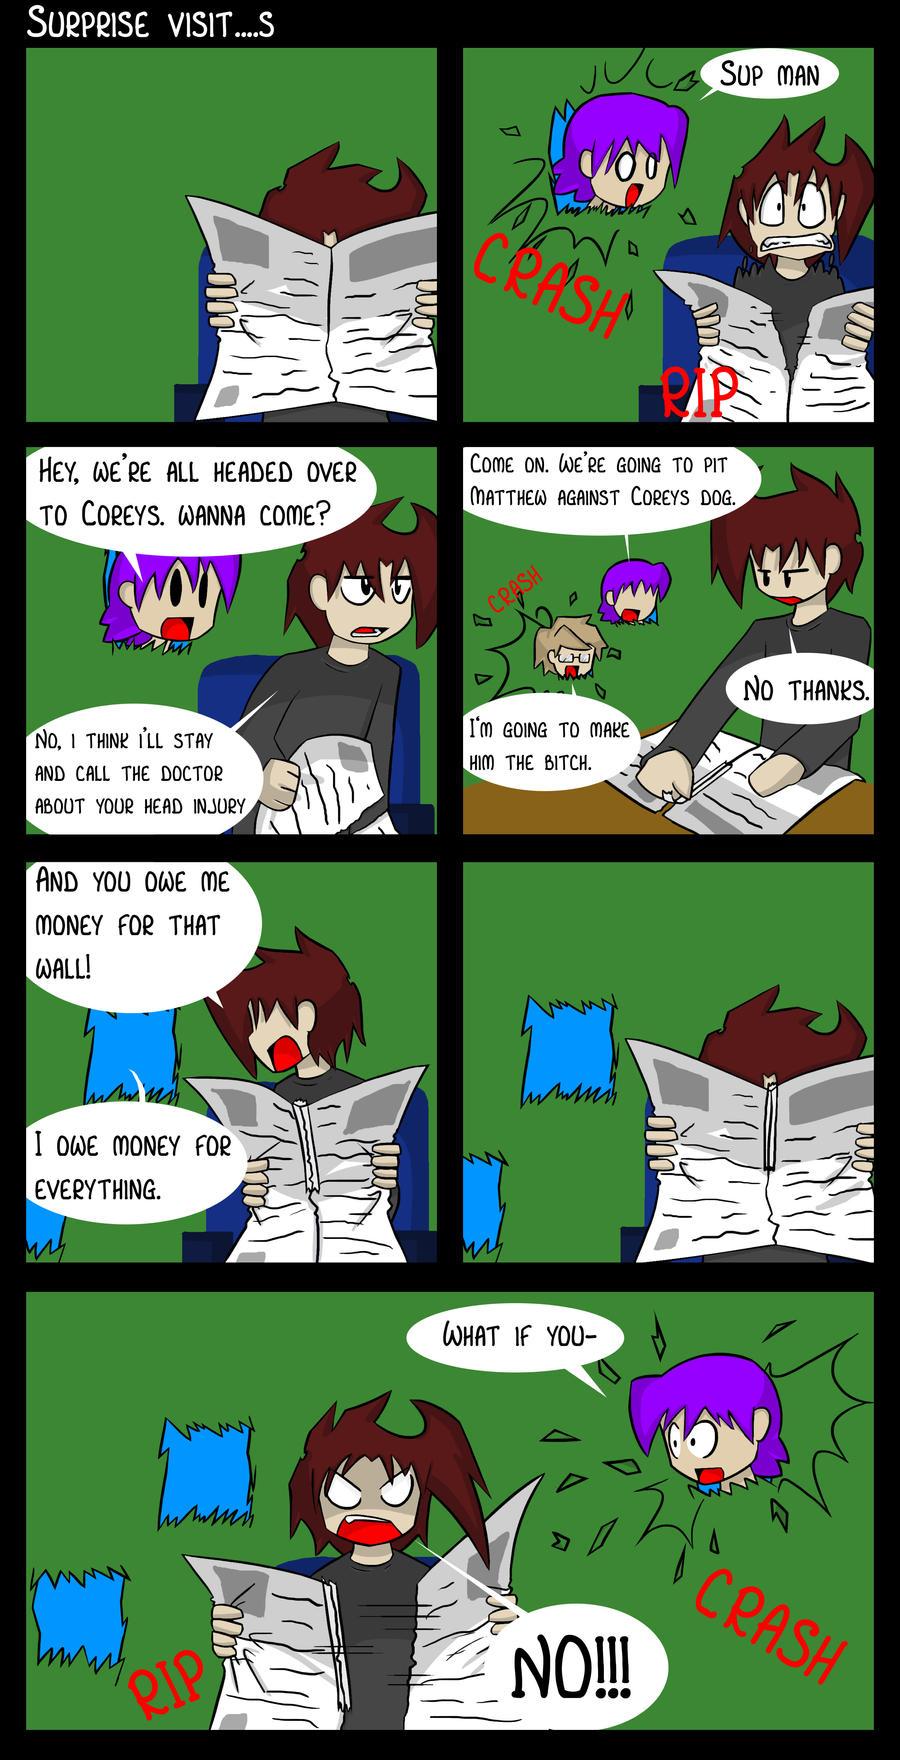 Comic Book Book 3 by DukeStewart